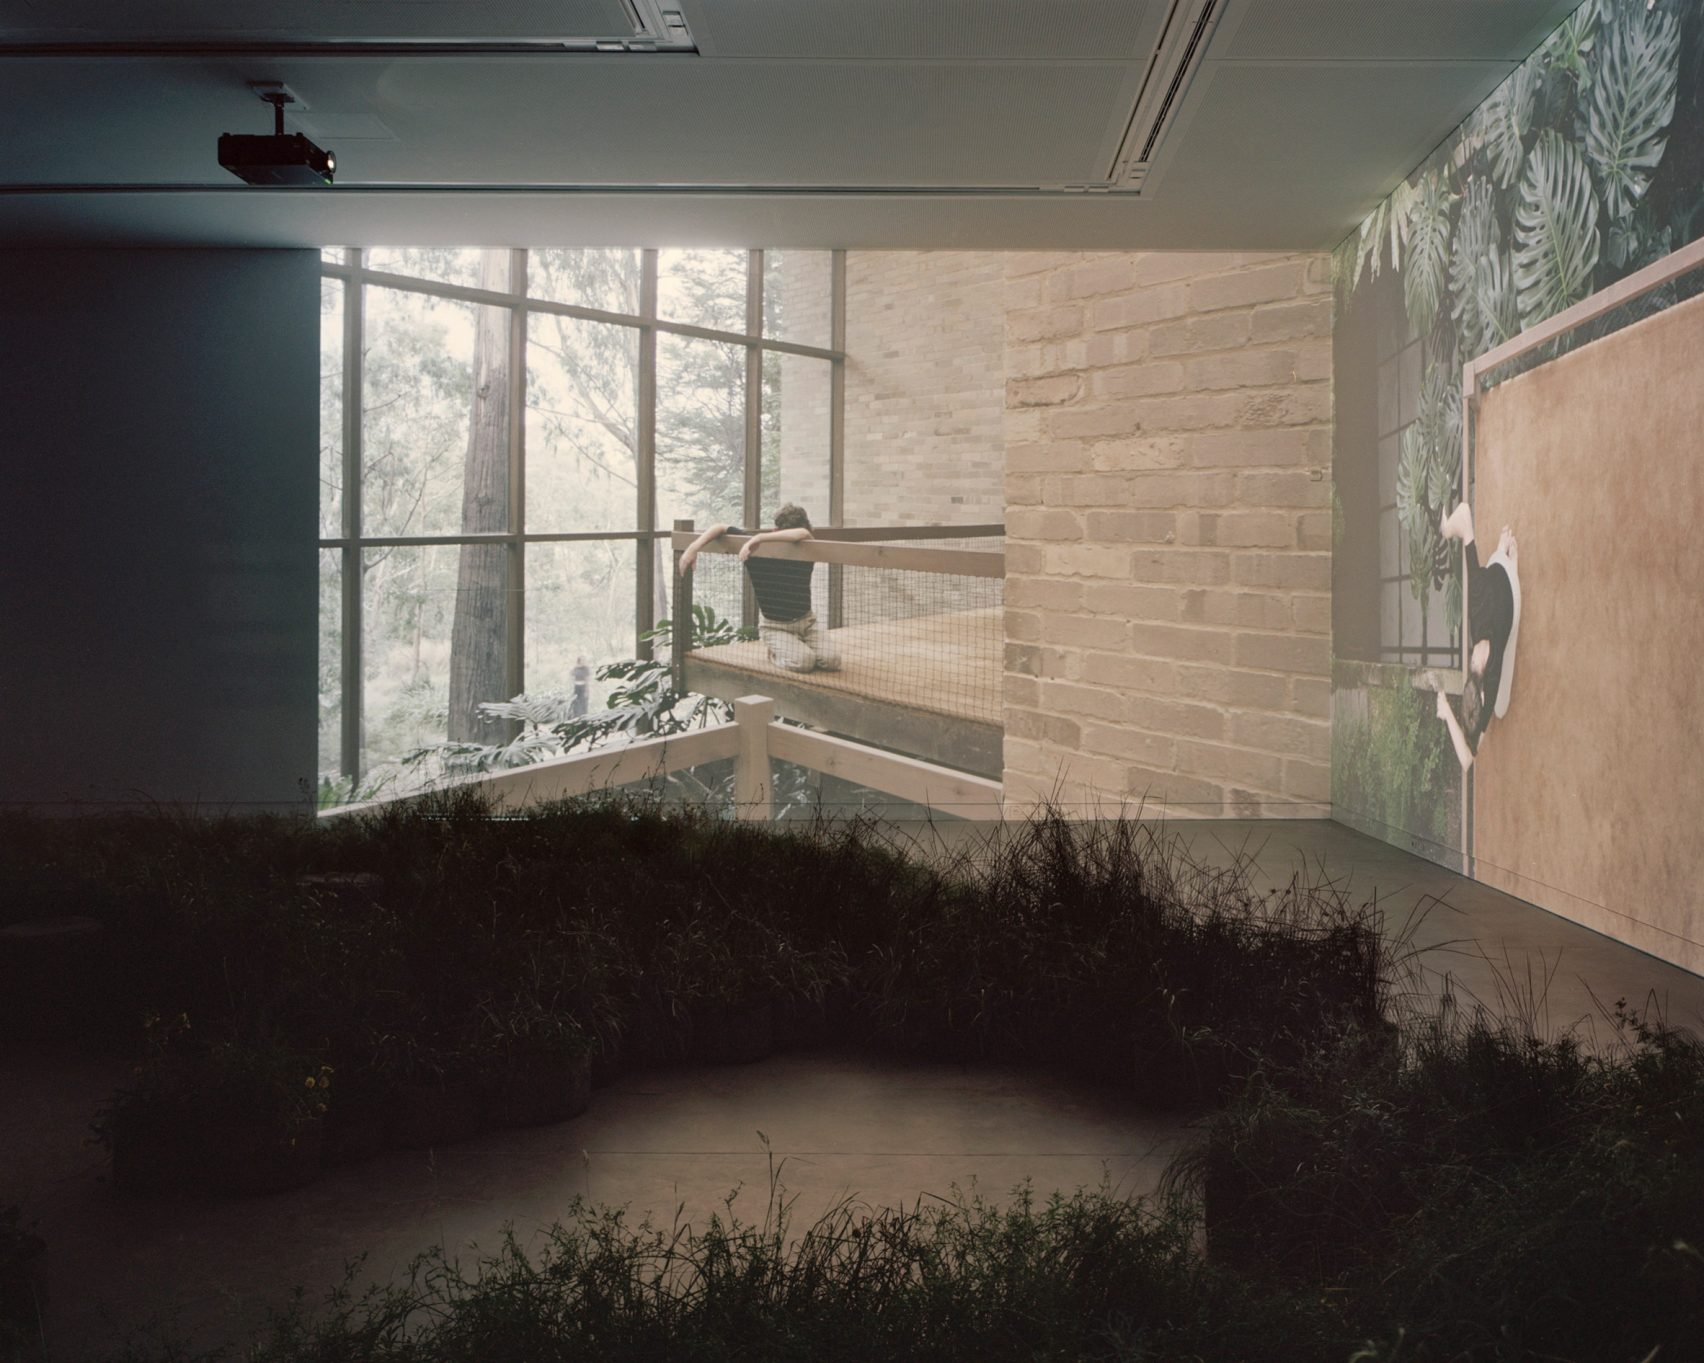 Grasslands-Repair-Pabellon-Australia-Venecia-Baracco-Wright-Rory-Gardiner-04